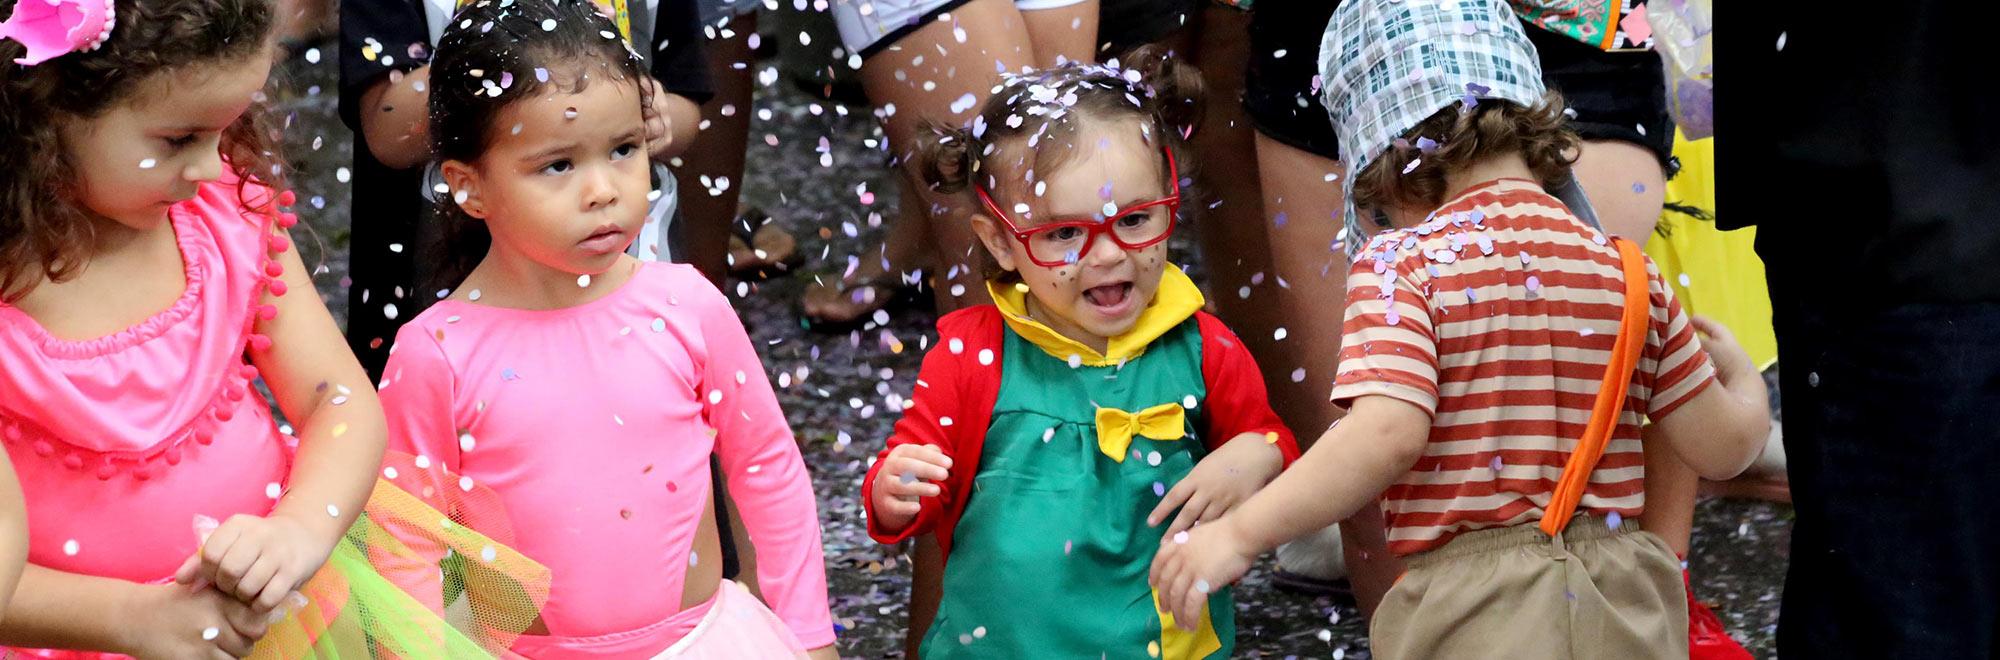 carnaval no abc paulista vipzinho